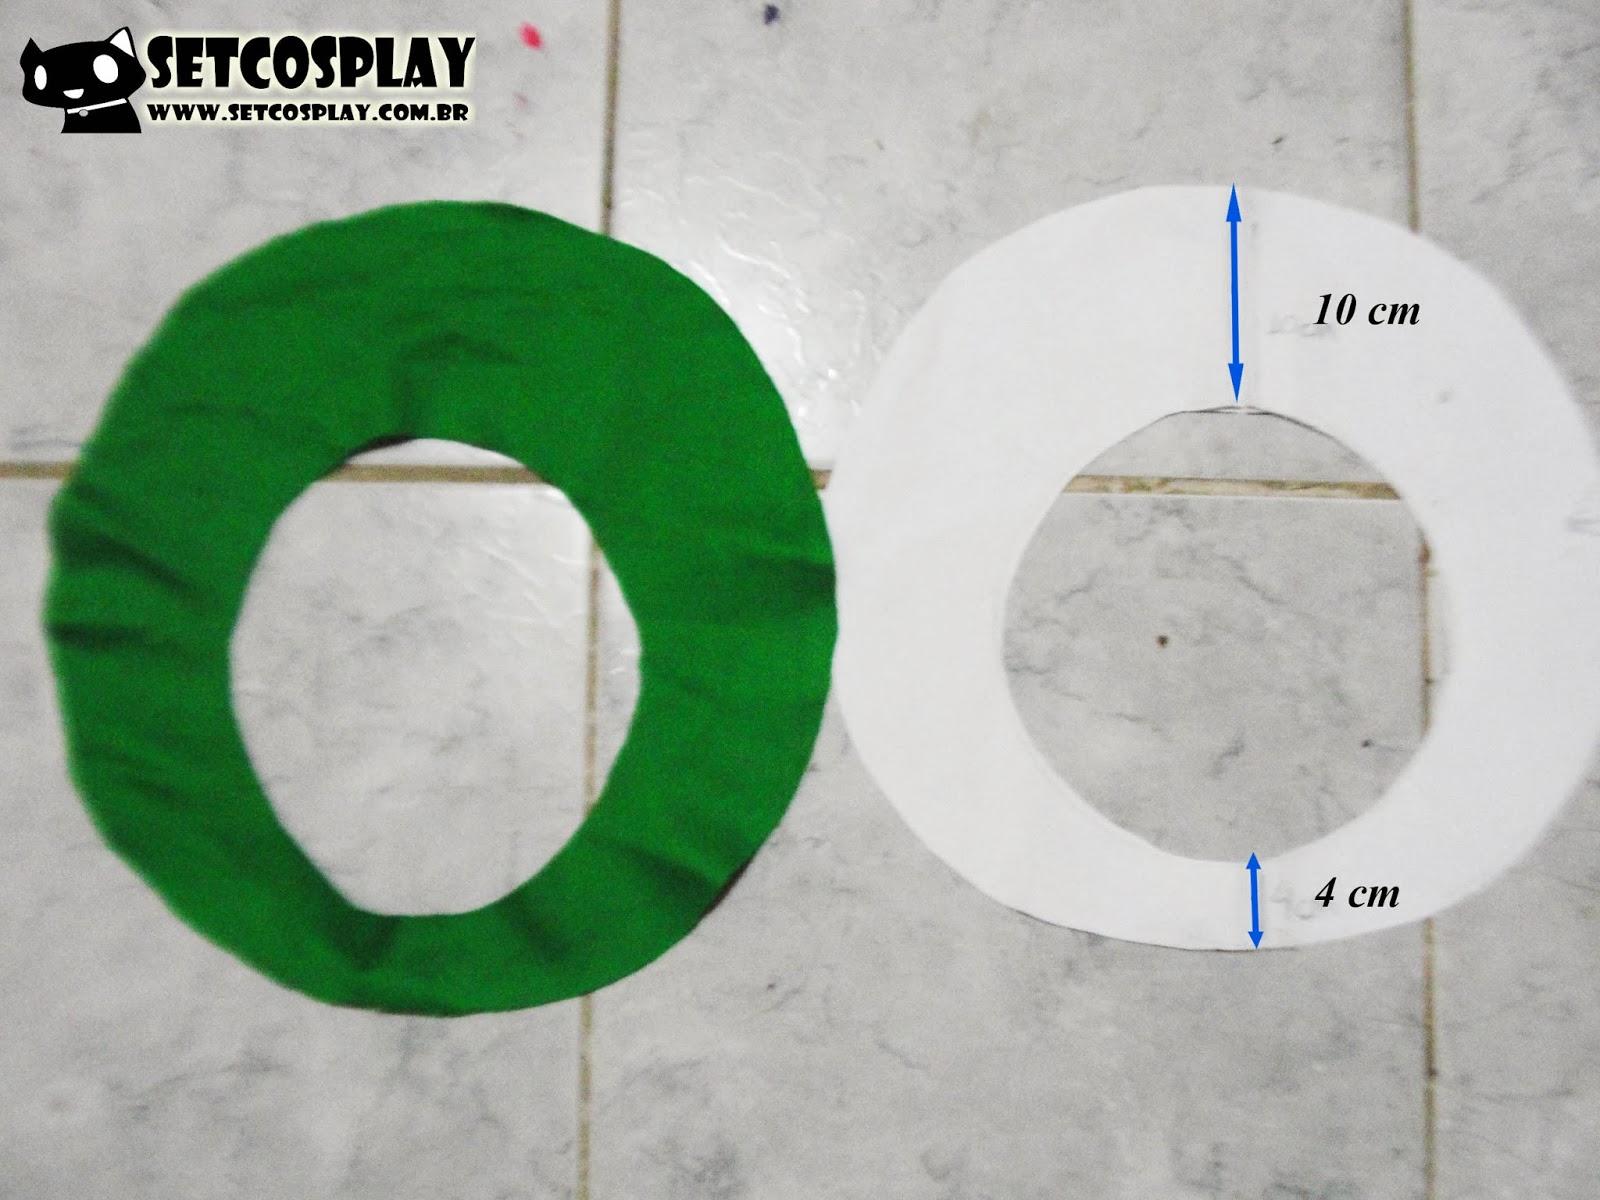 SetCosplay   TUTORIAL  Boina (Cap) do Luigi Mario + Roupa Cosplay e4c8c197fc8